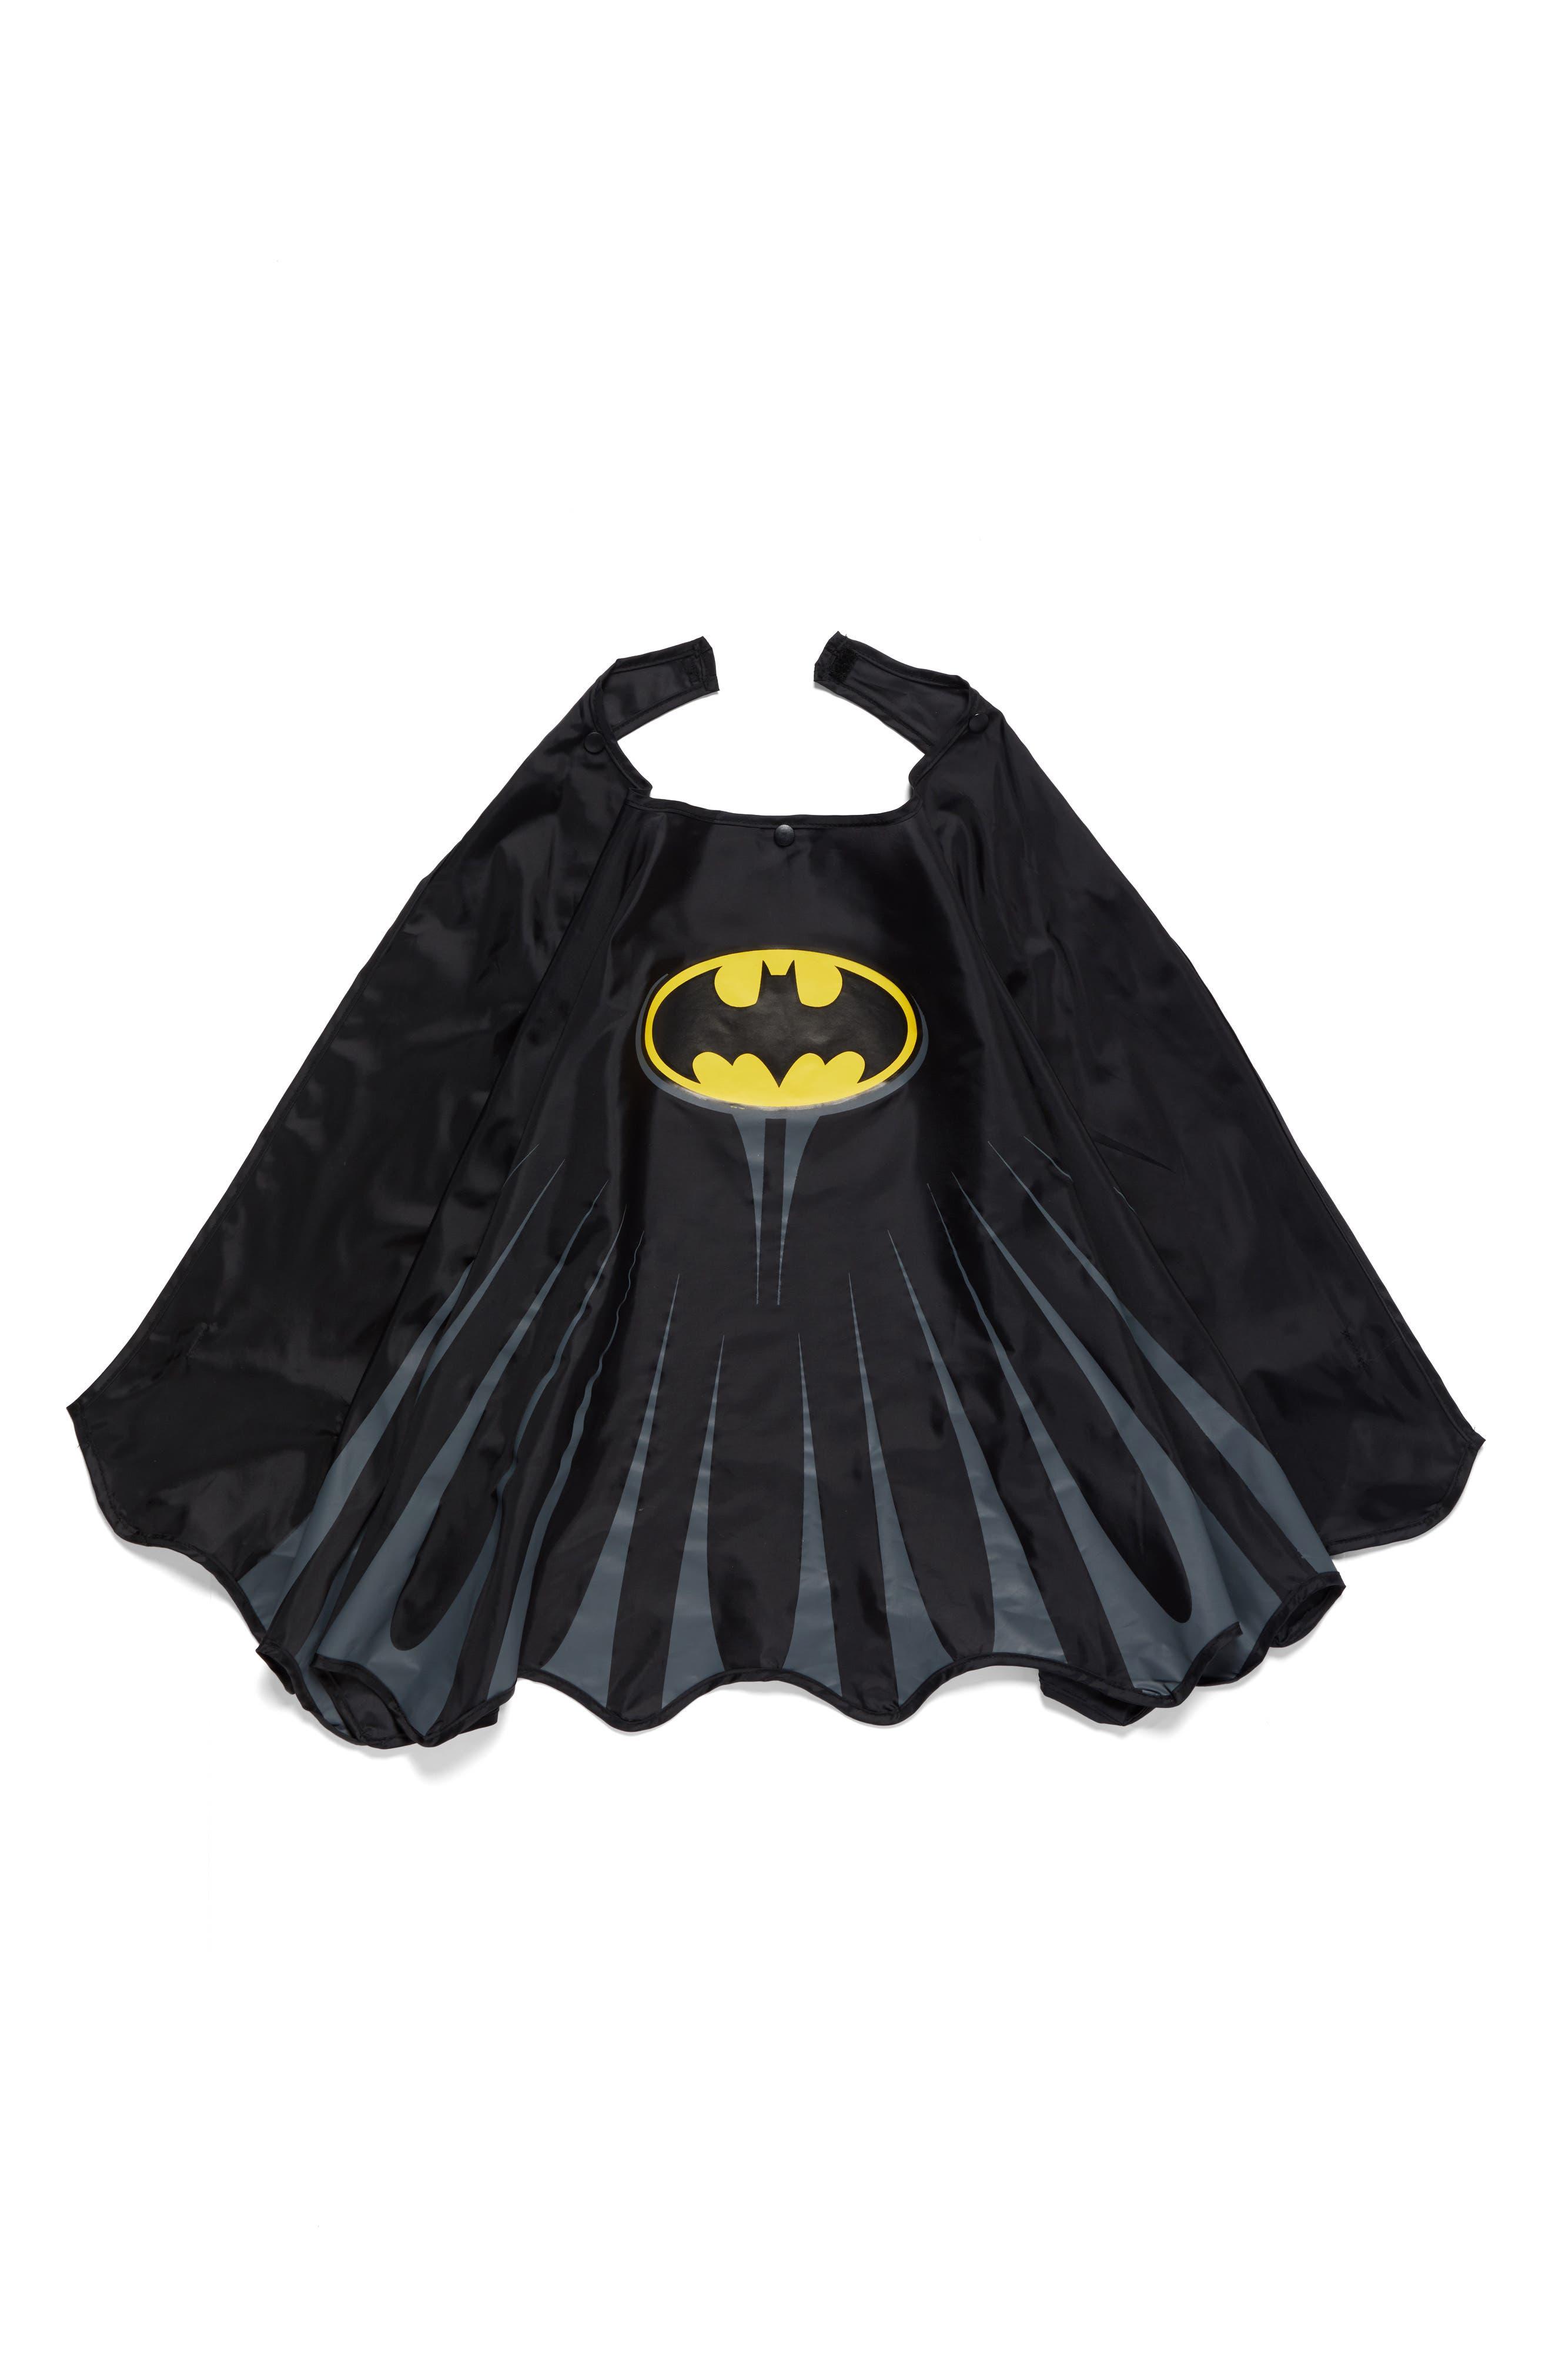 Batman Everlasting Hooded Raincoat,                             Alternate thumbnail 3, color,                             Black